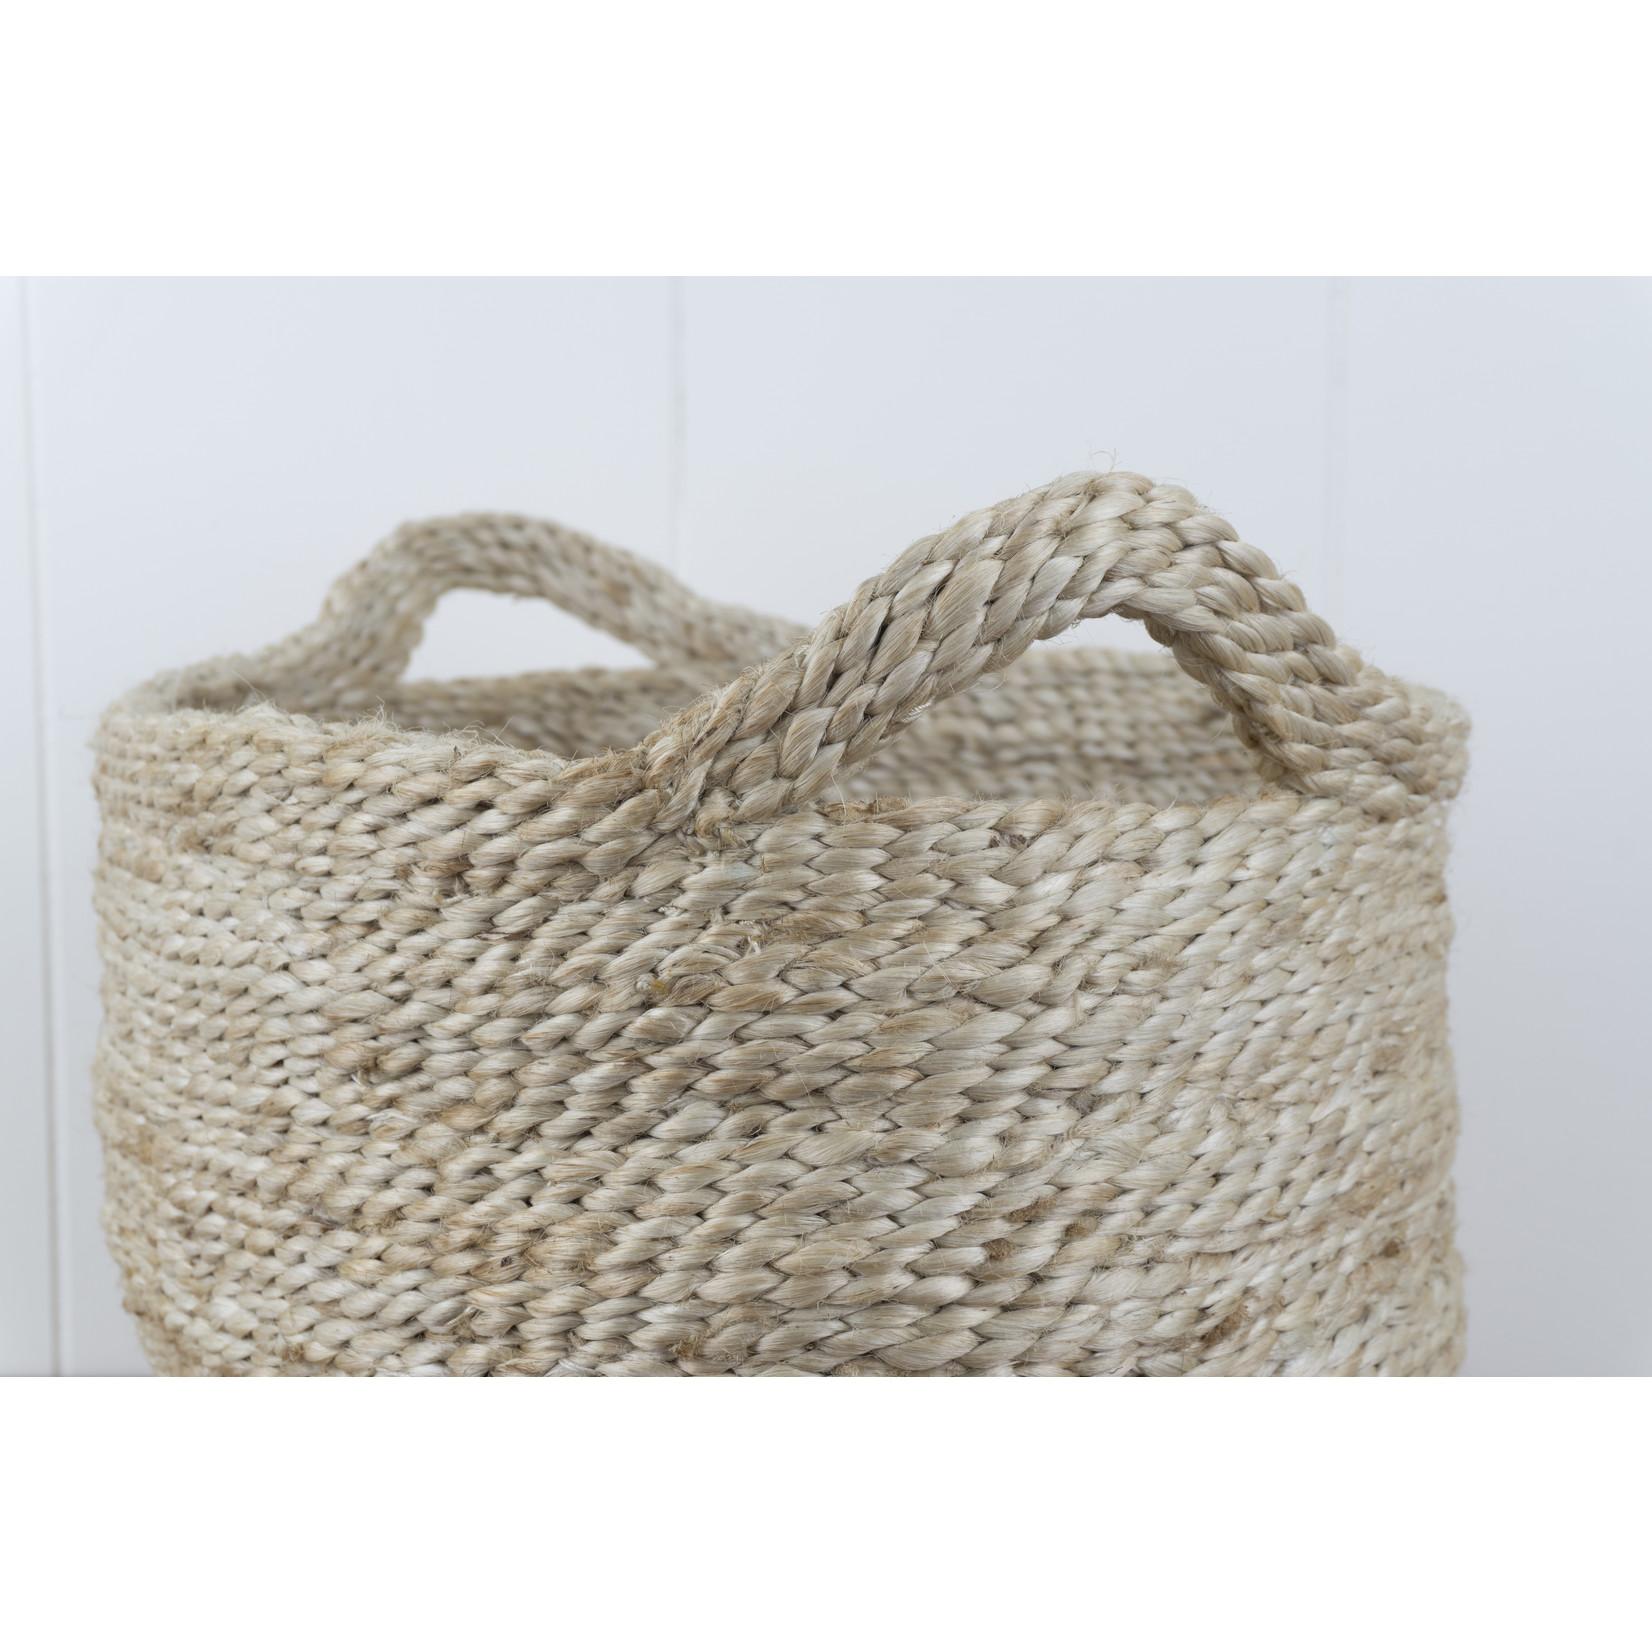 Small Oval Jute Basket